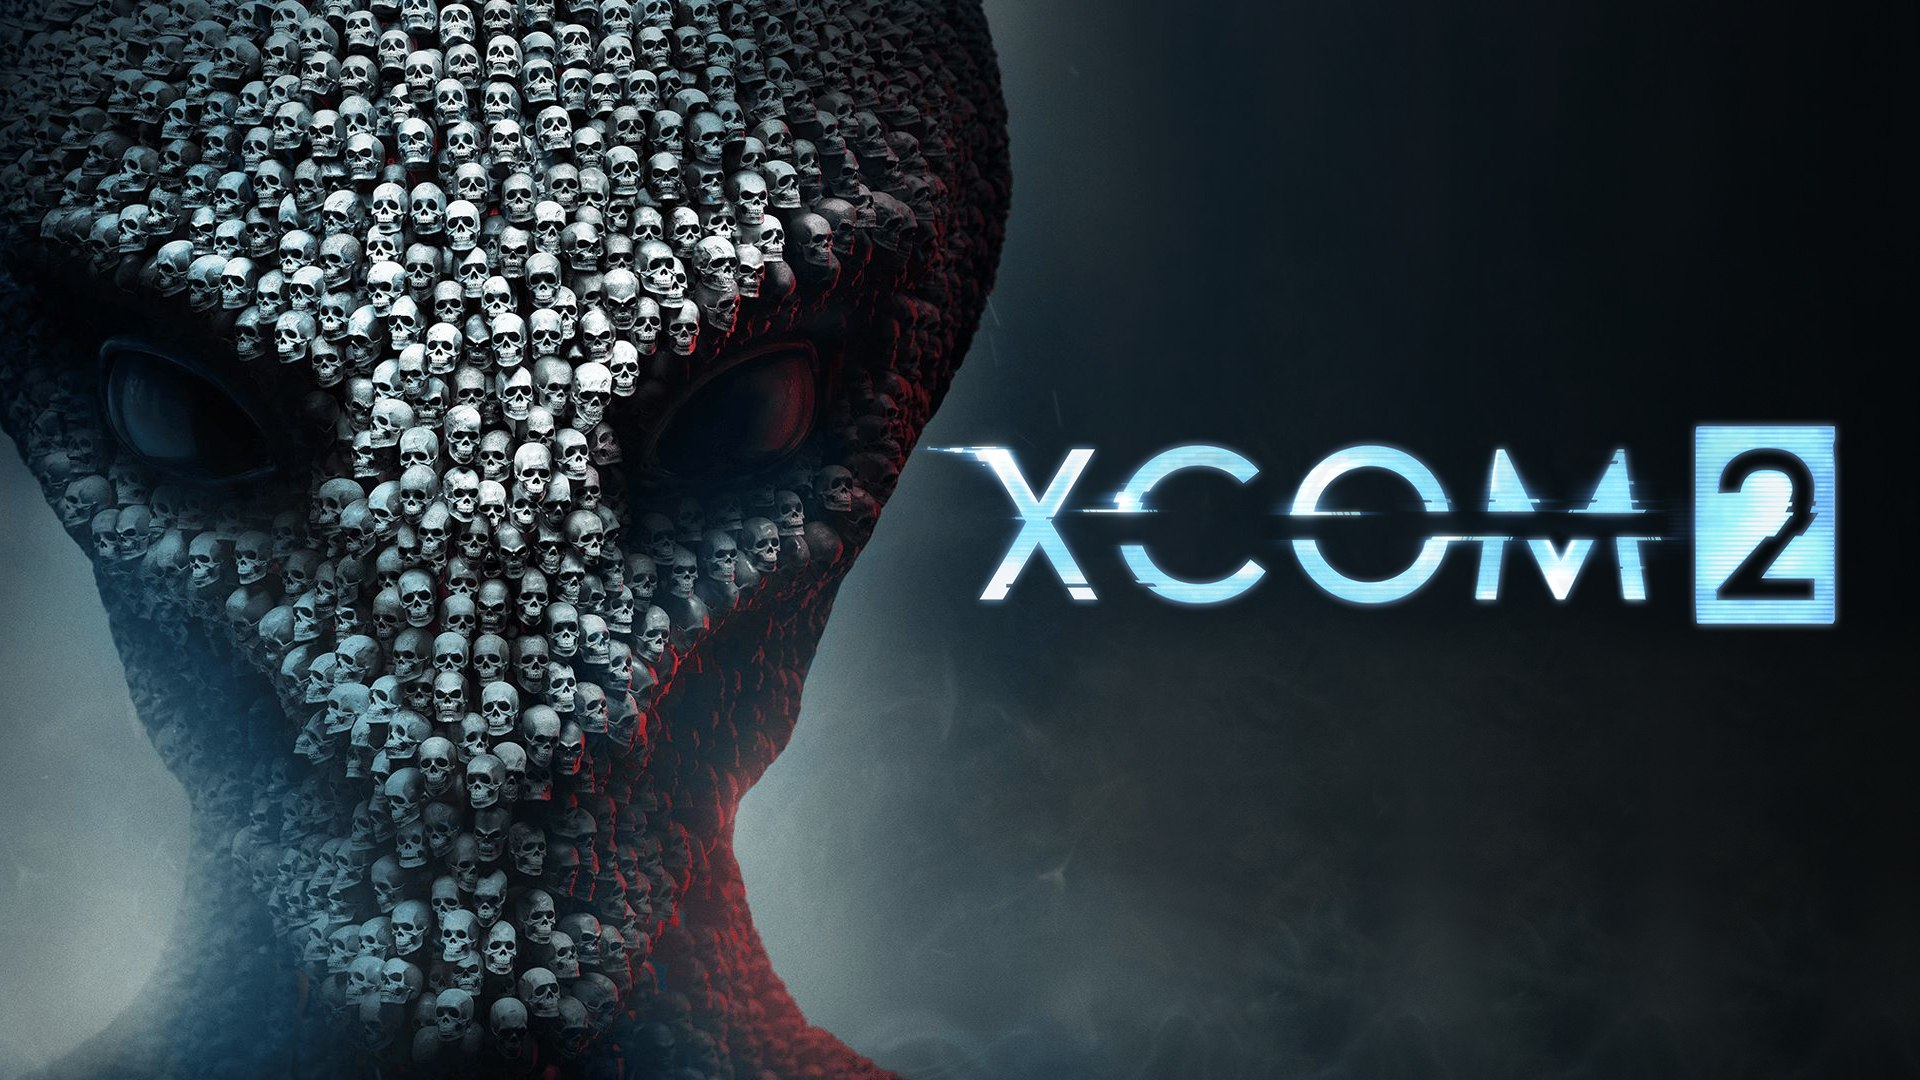 Guía XCOM 2 - 10 Consejos para Principiantes